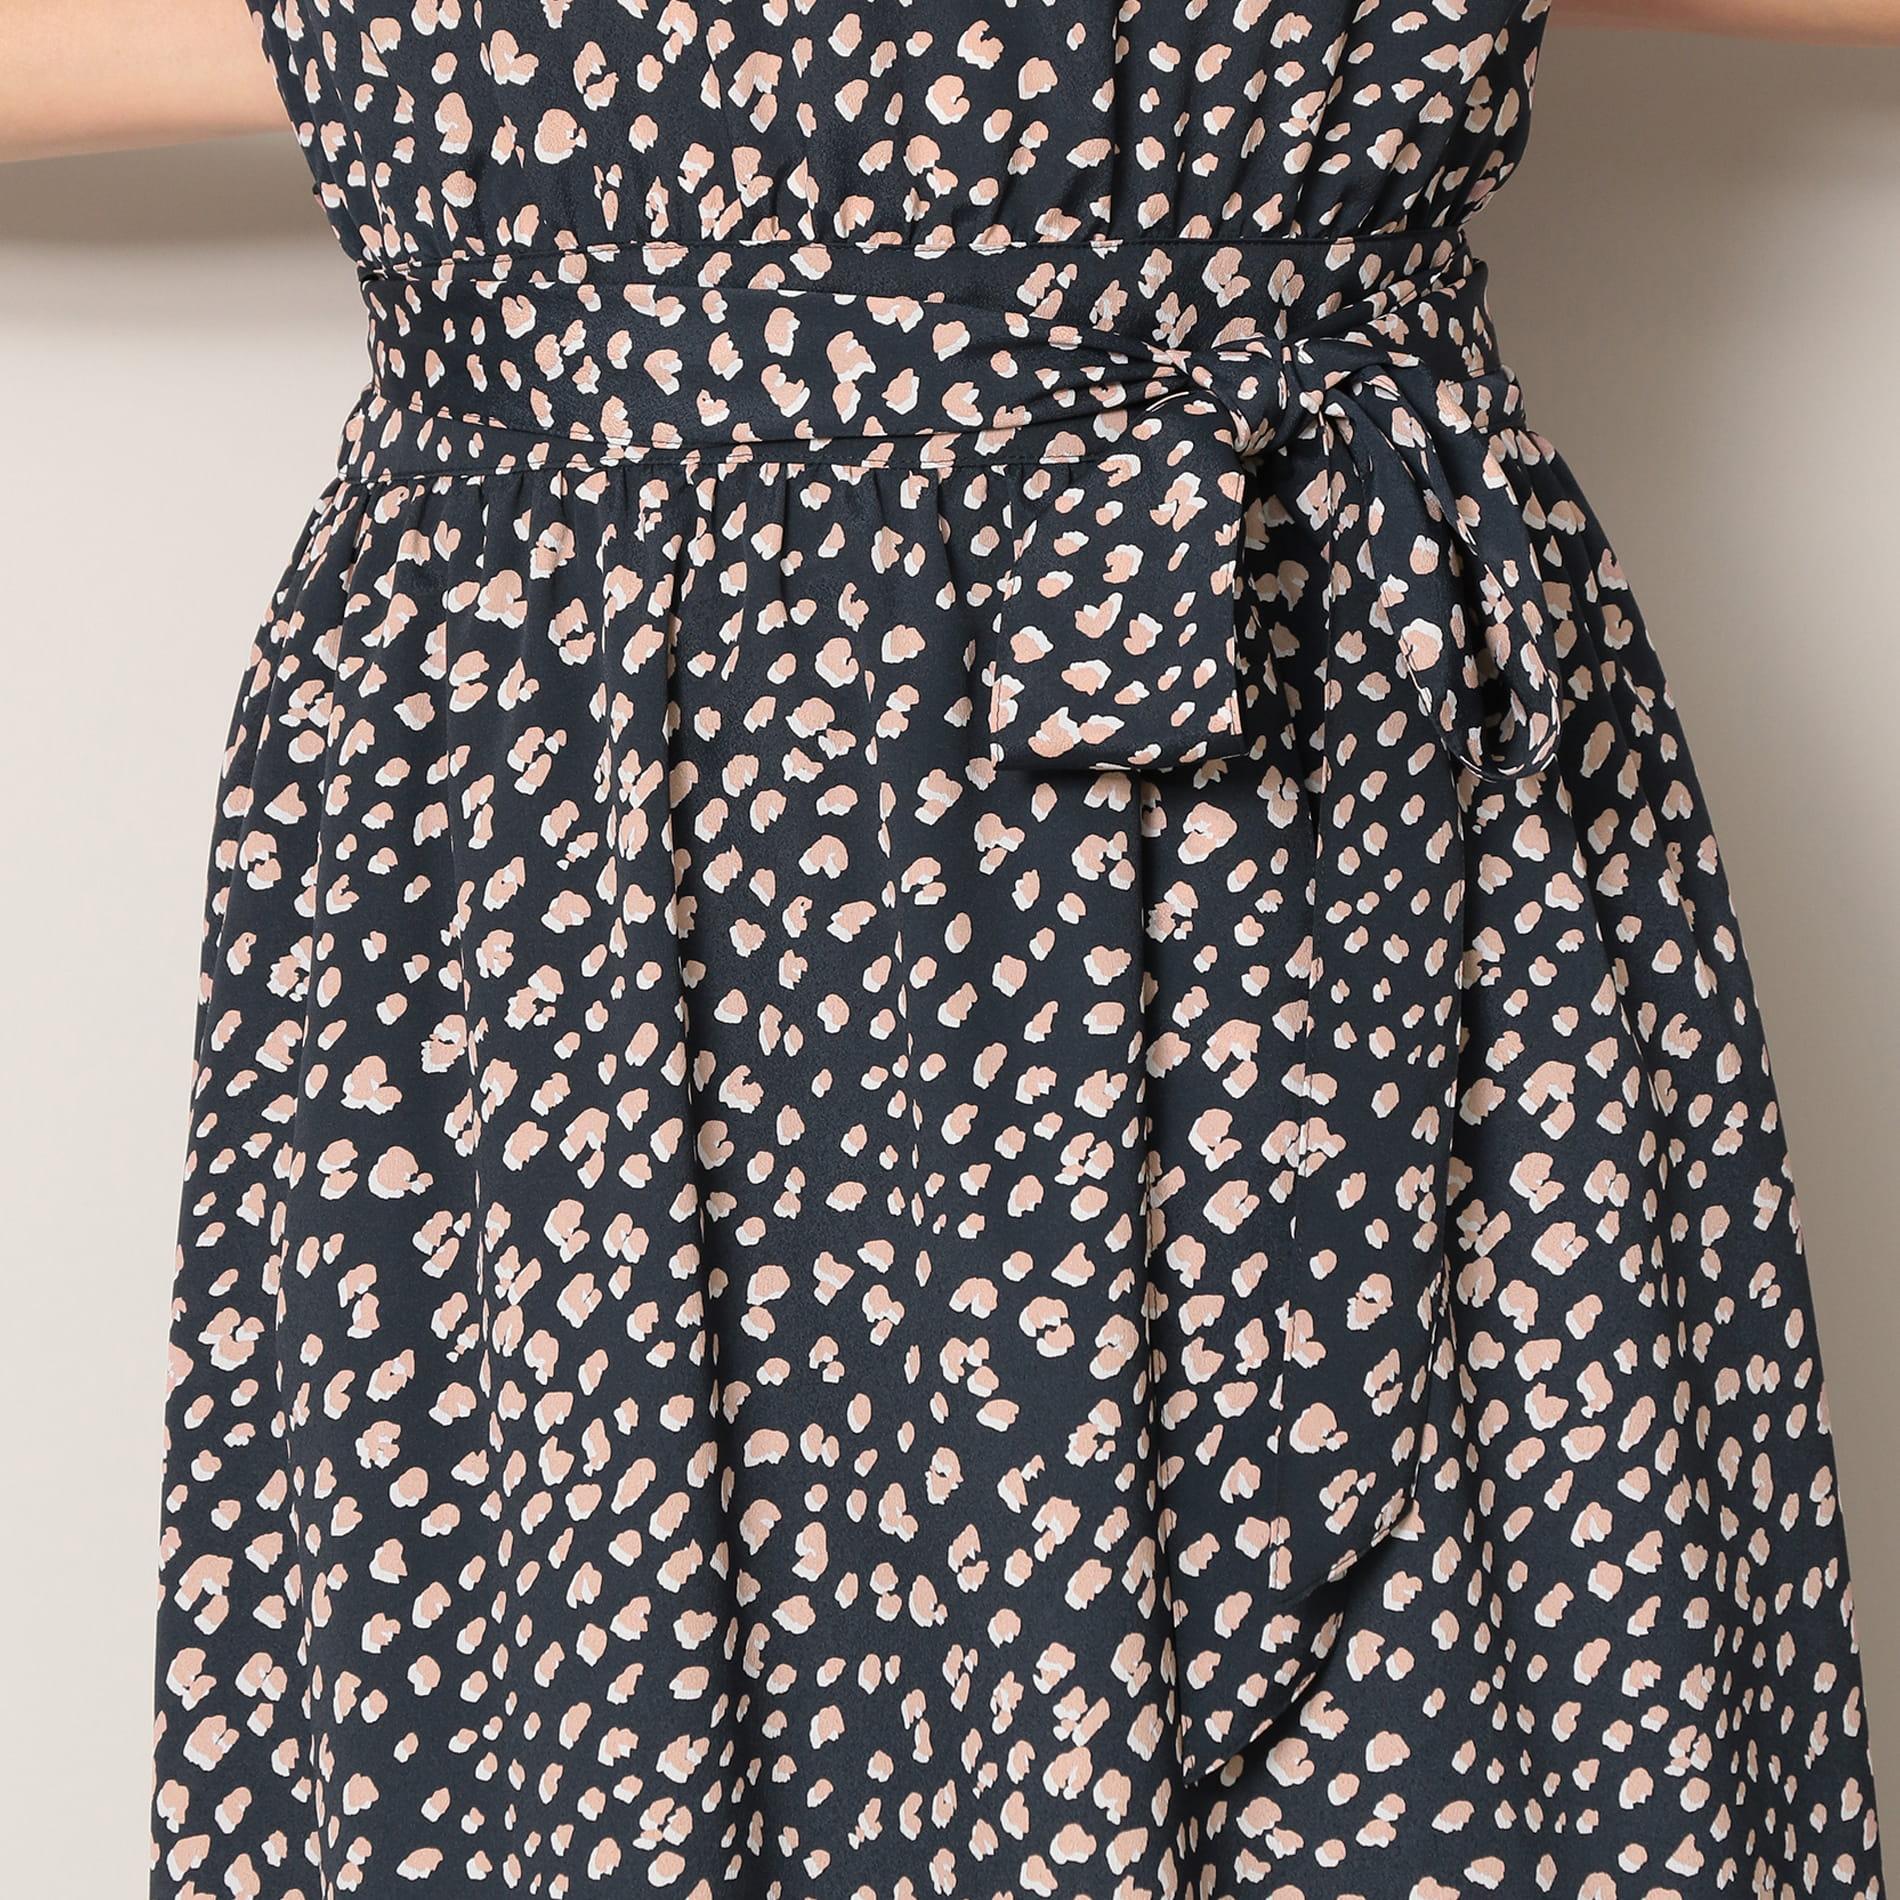 【EPOCA THE SHOP】アニマルプリントドレス